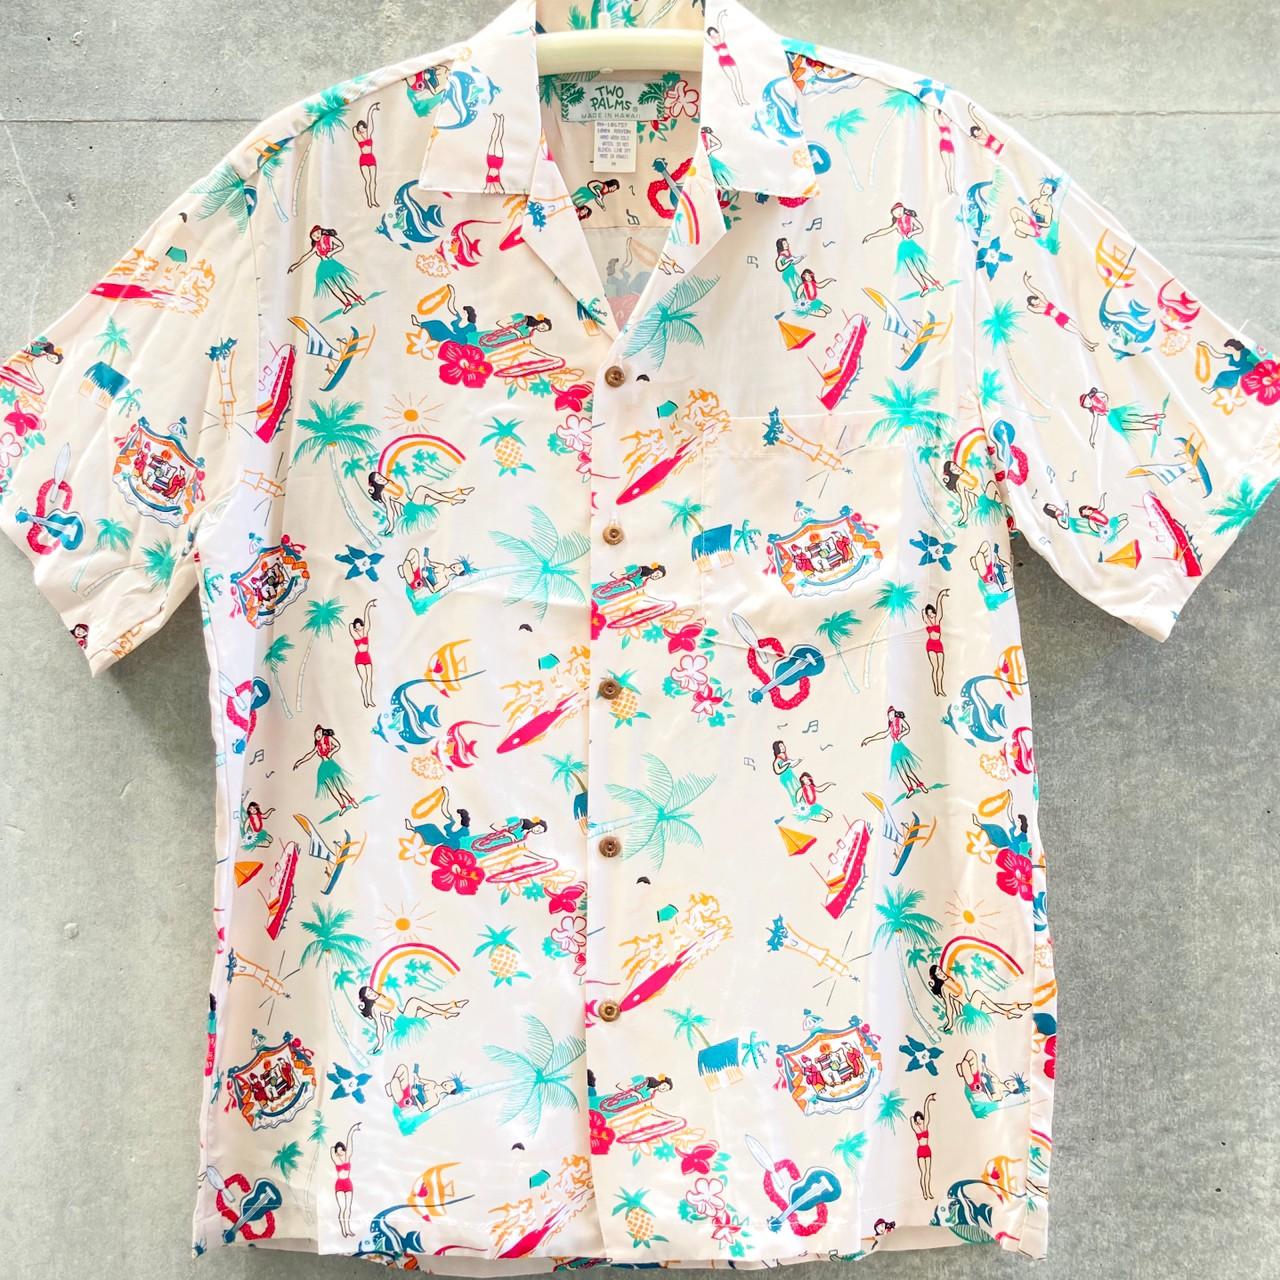 Mensアロハシャツ/Vintage Aloha/Cream・Light Blue